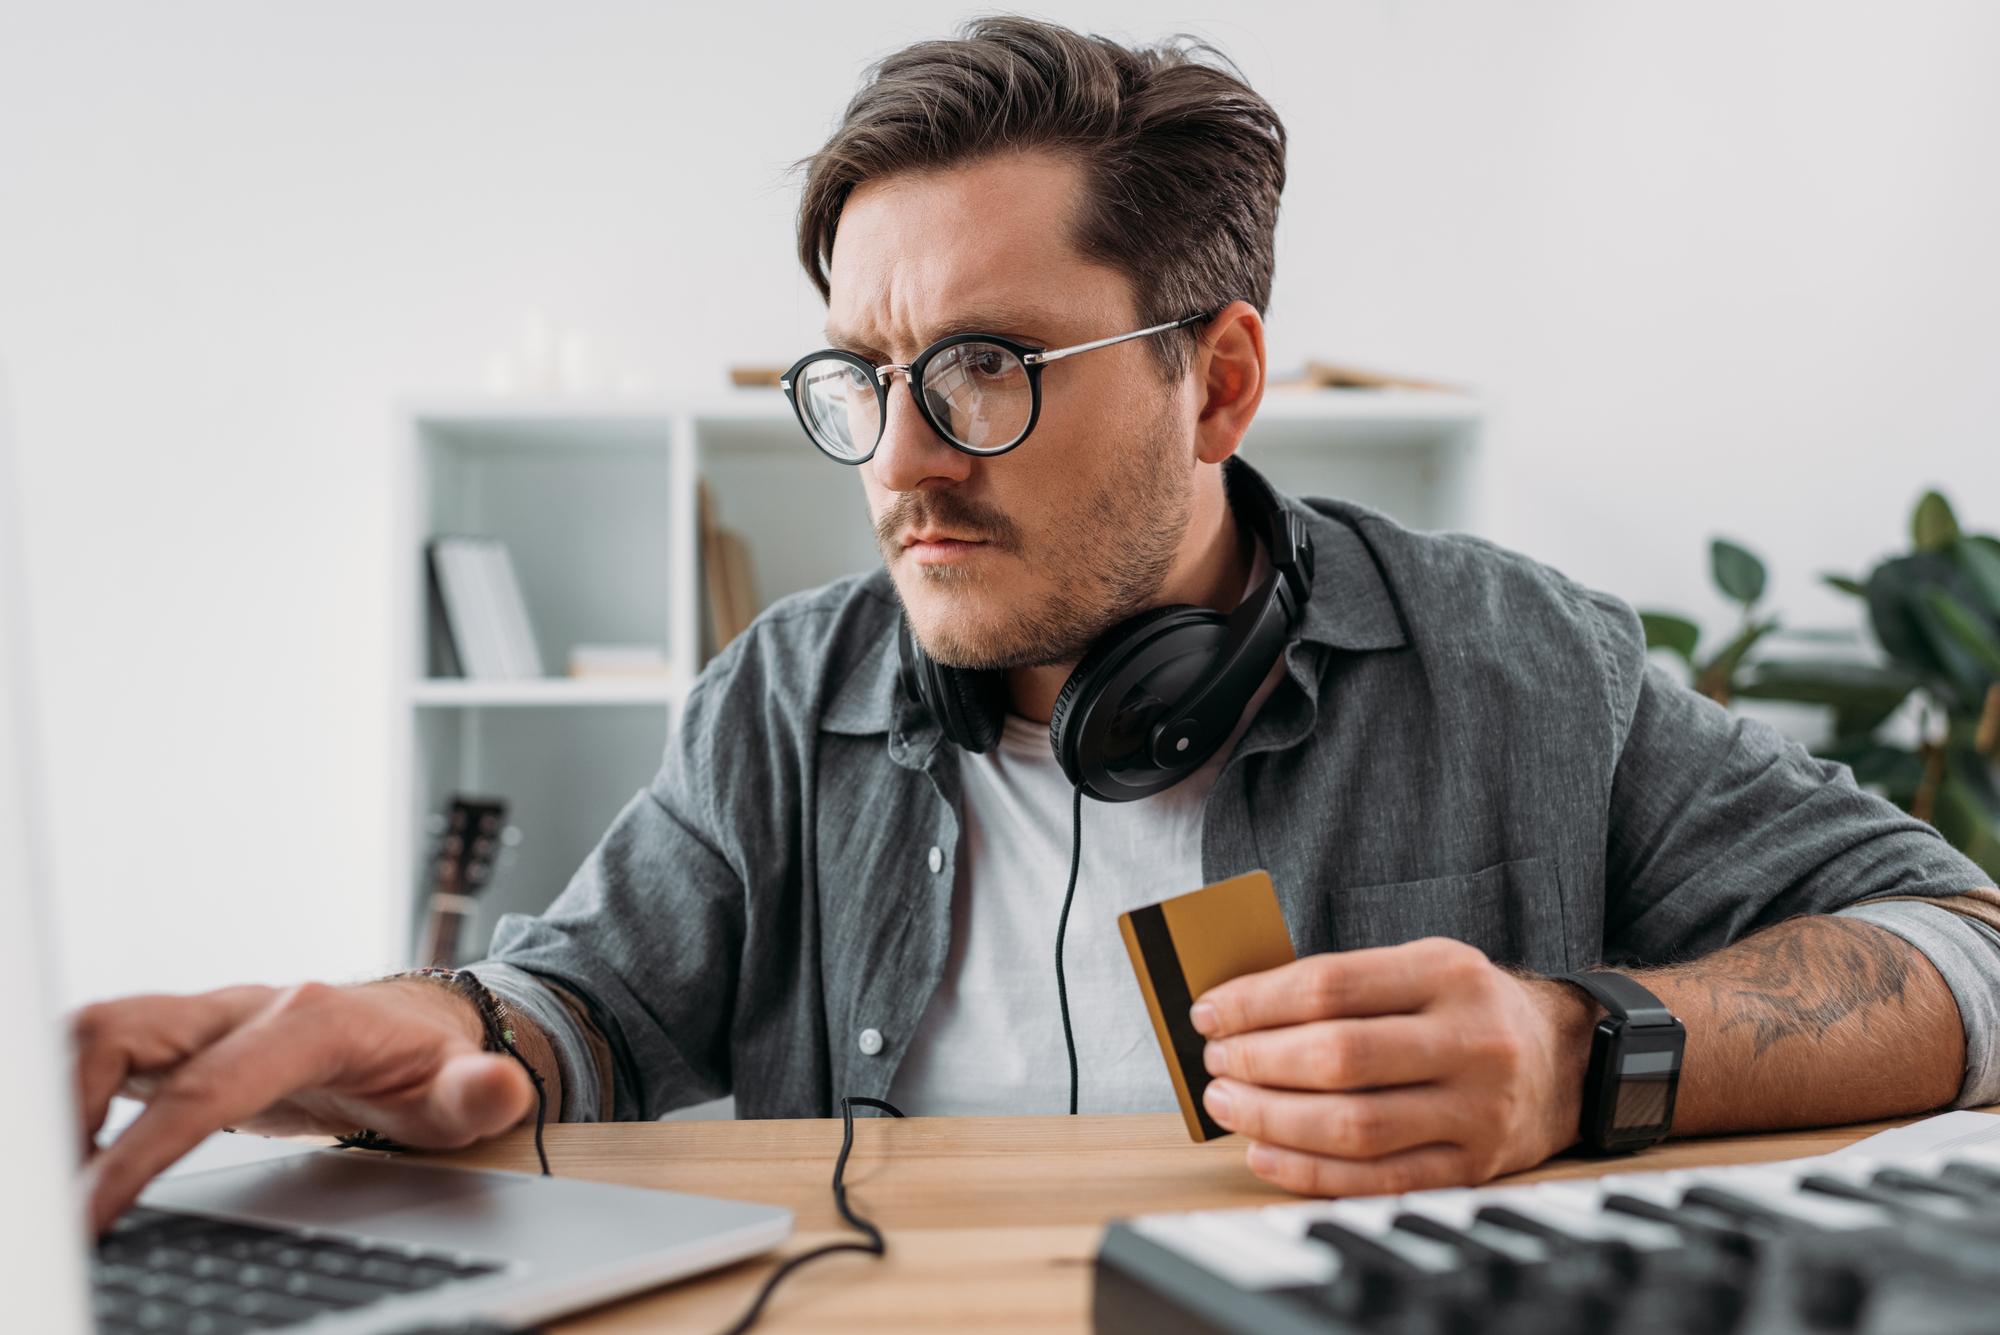 Dn 24 банк бизнес онлайн личный кабинет